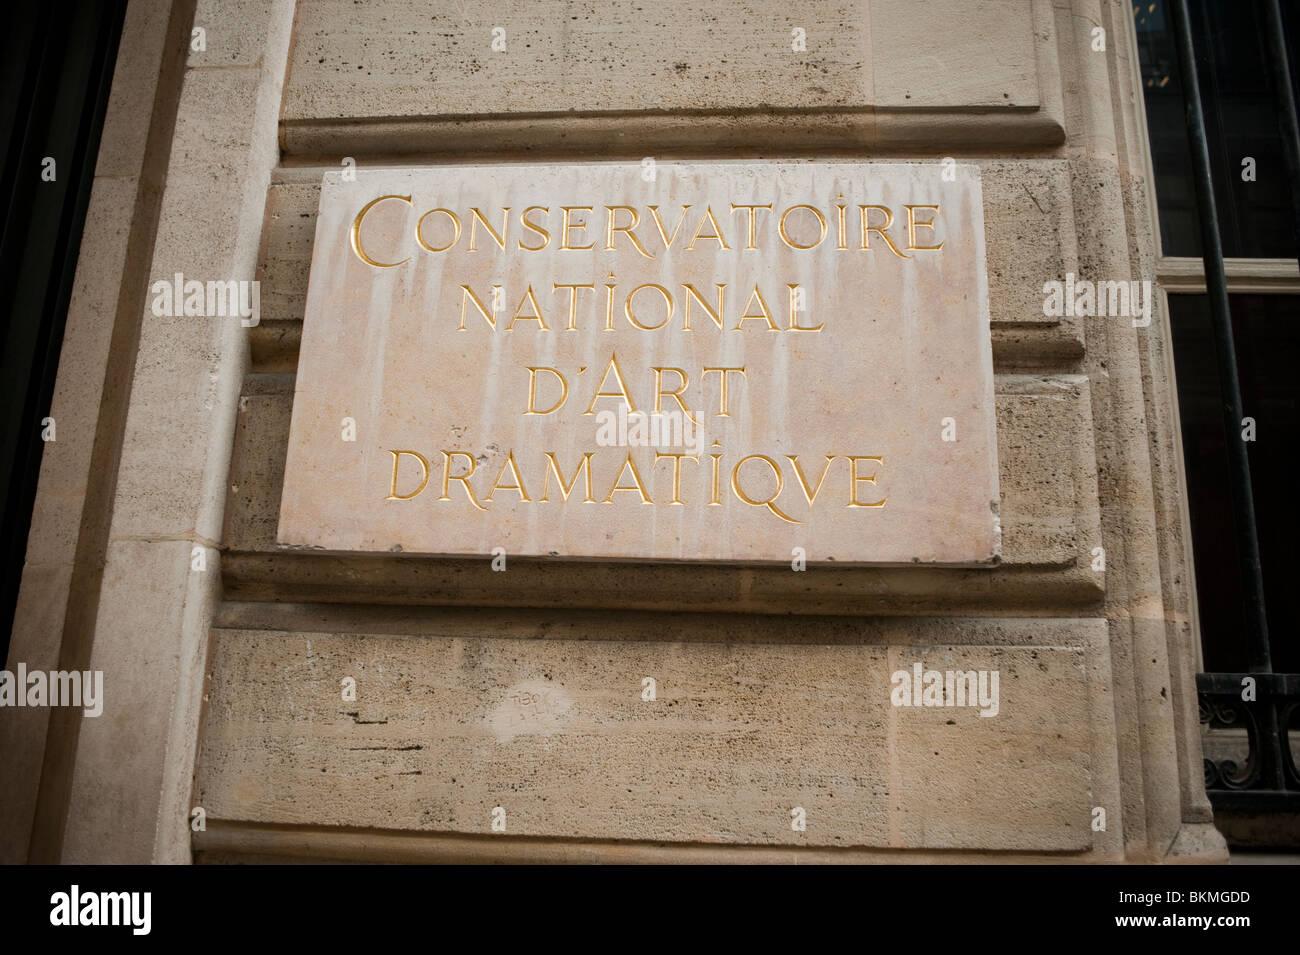 Conservatoire d'Art Dramatique, Detail Plaque on Facade, Old Music Theater, Front, Paris, France - Stock Image